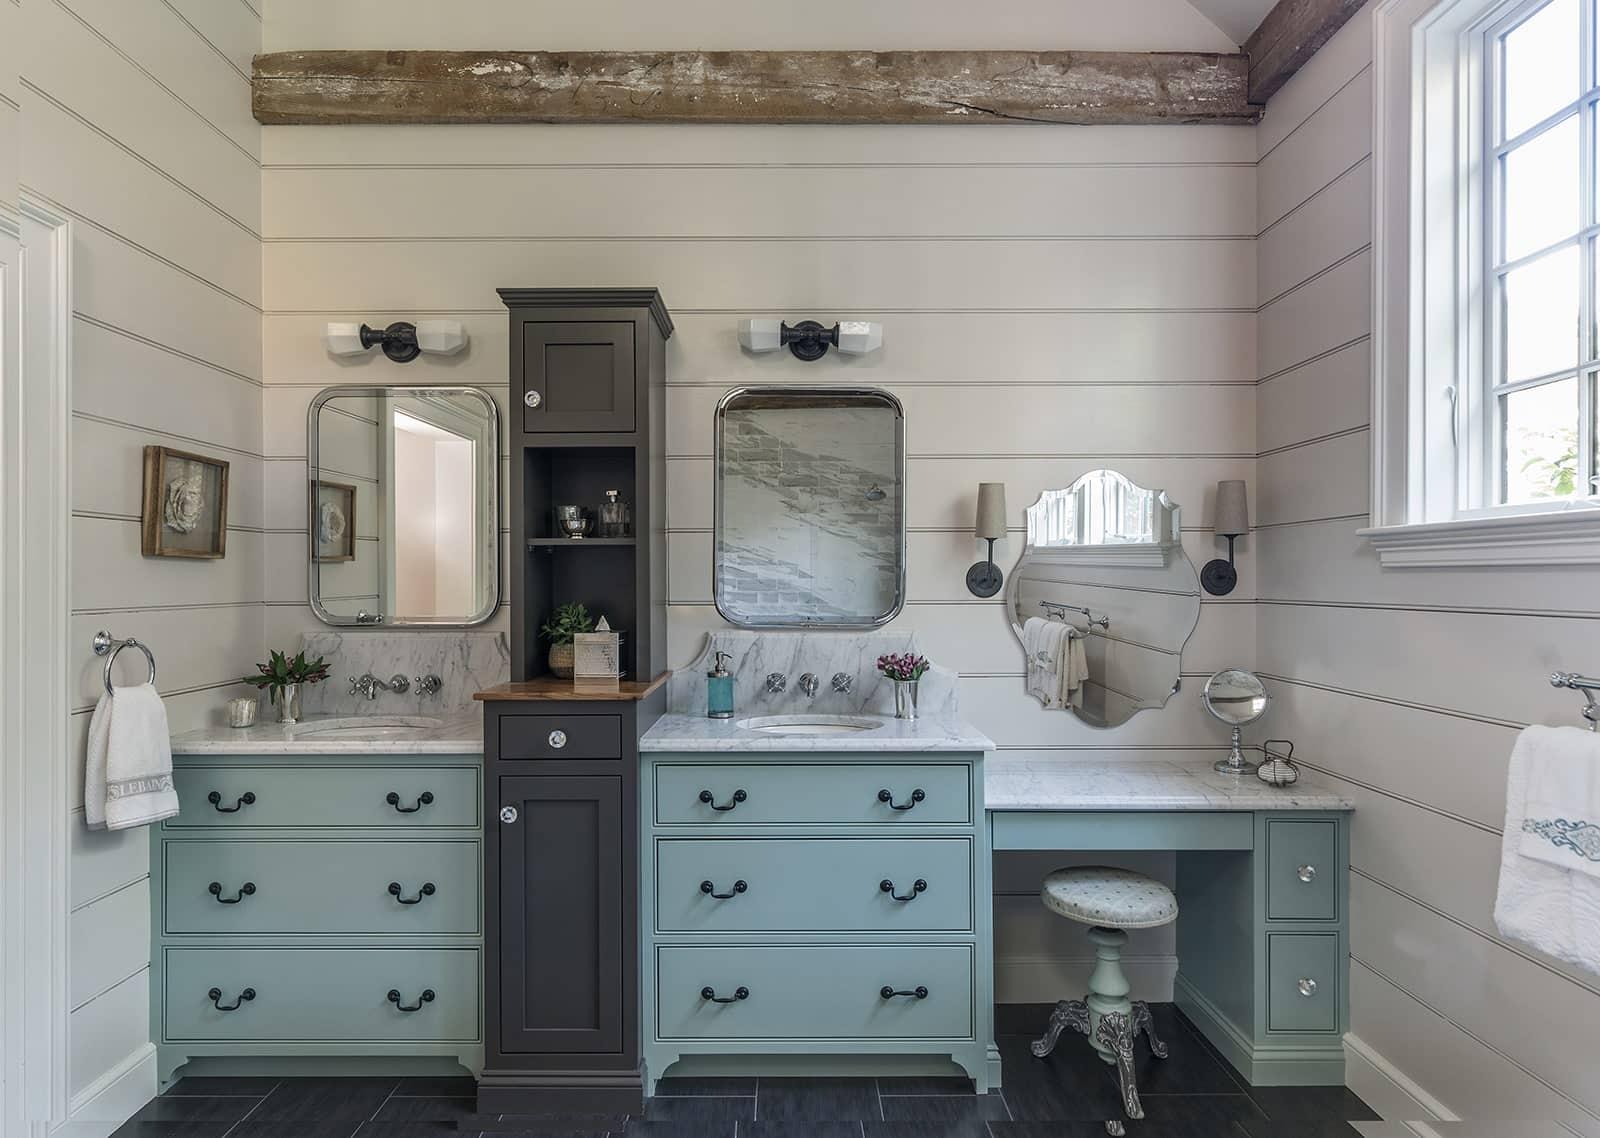 Farmhouse Flair Interiors Ipswich MA Bathroom